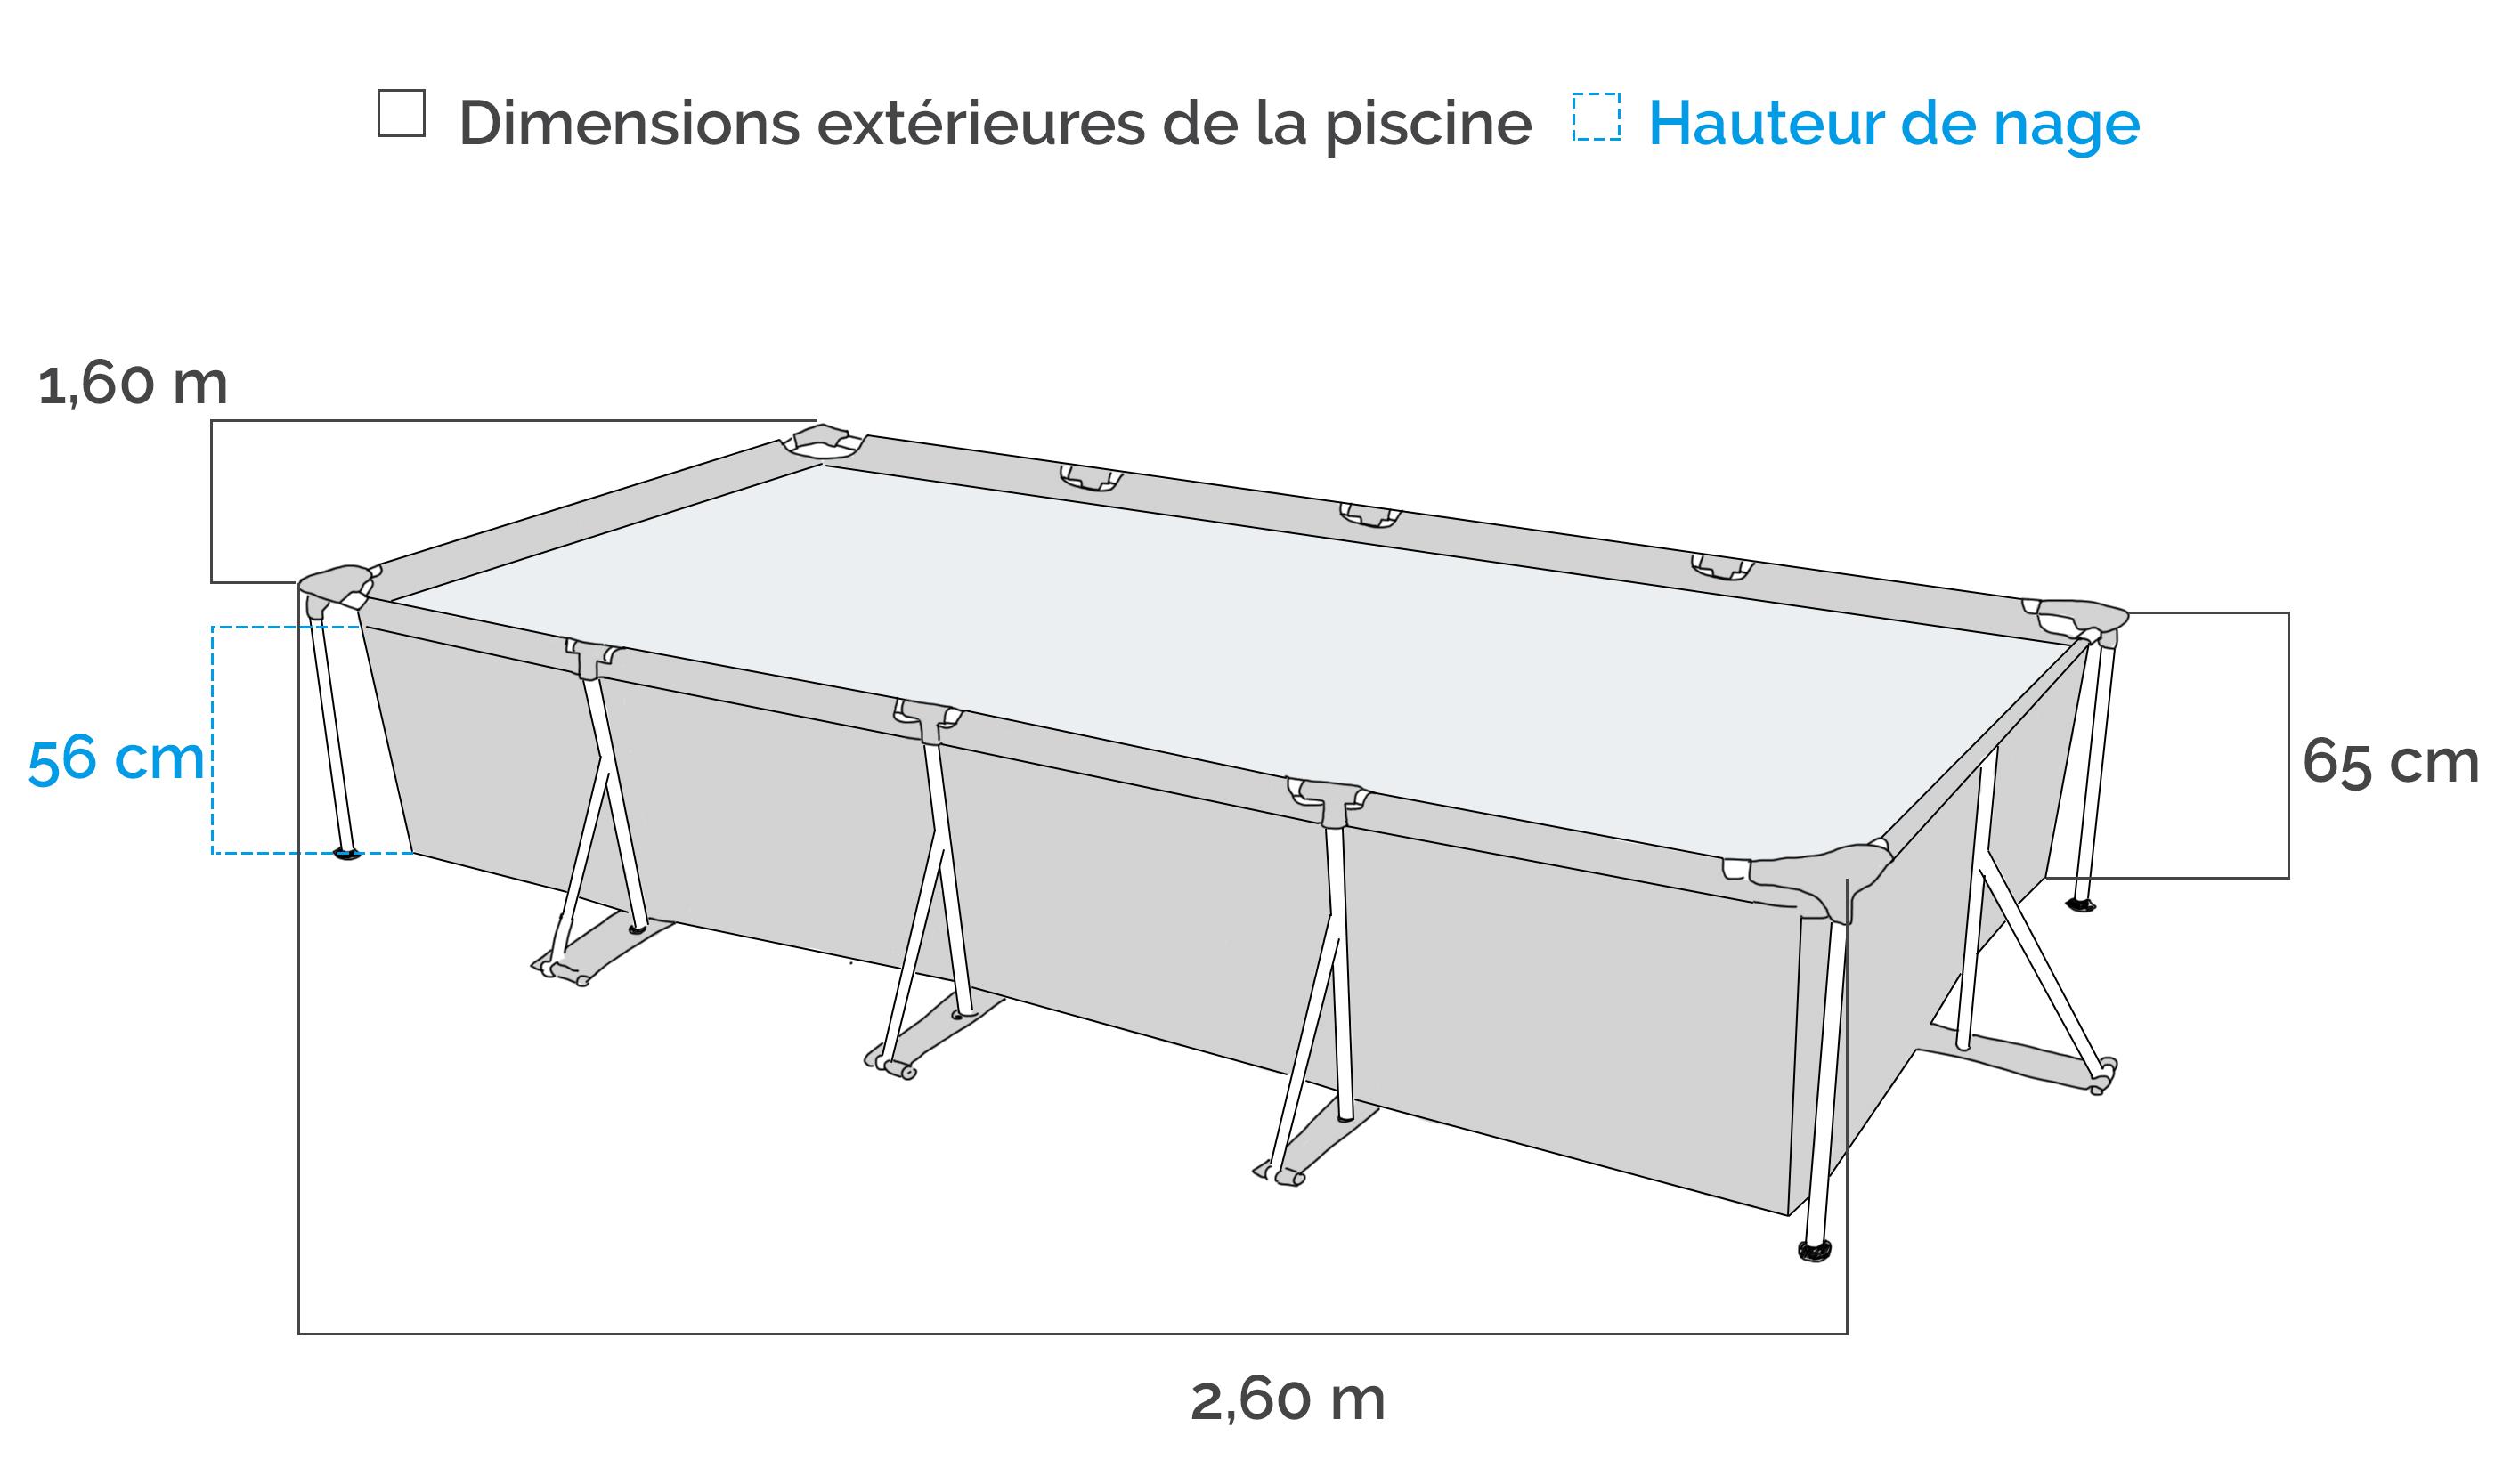 bache piscine 2 60x1 60